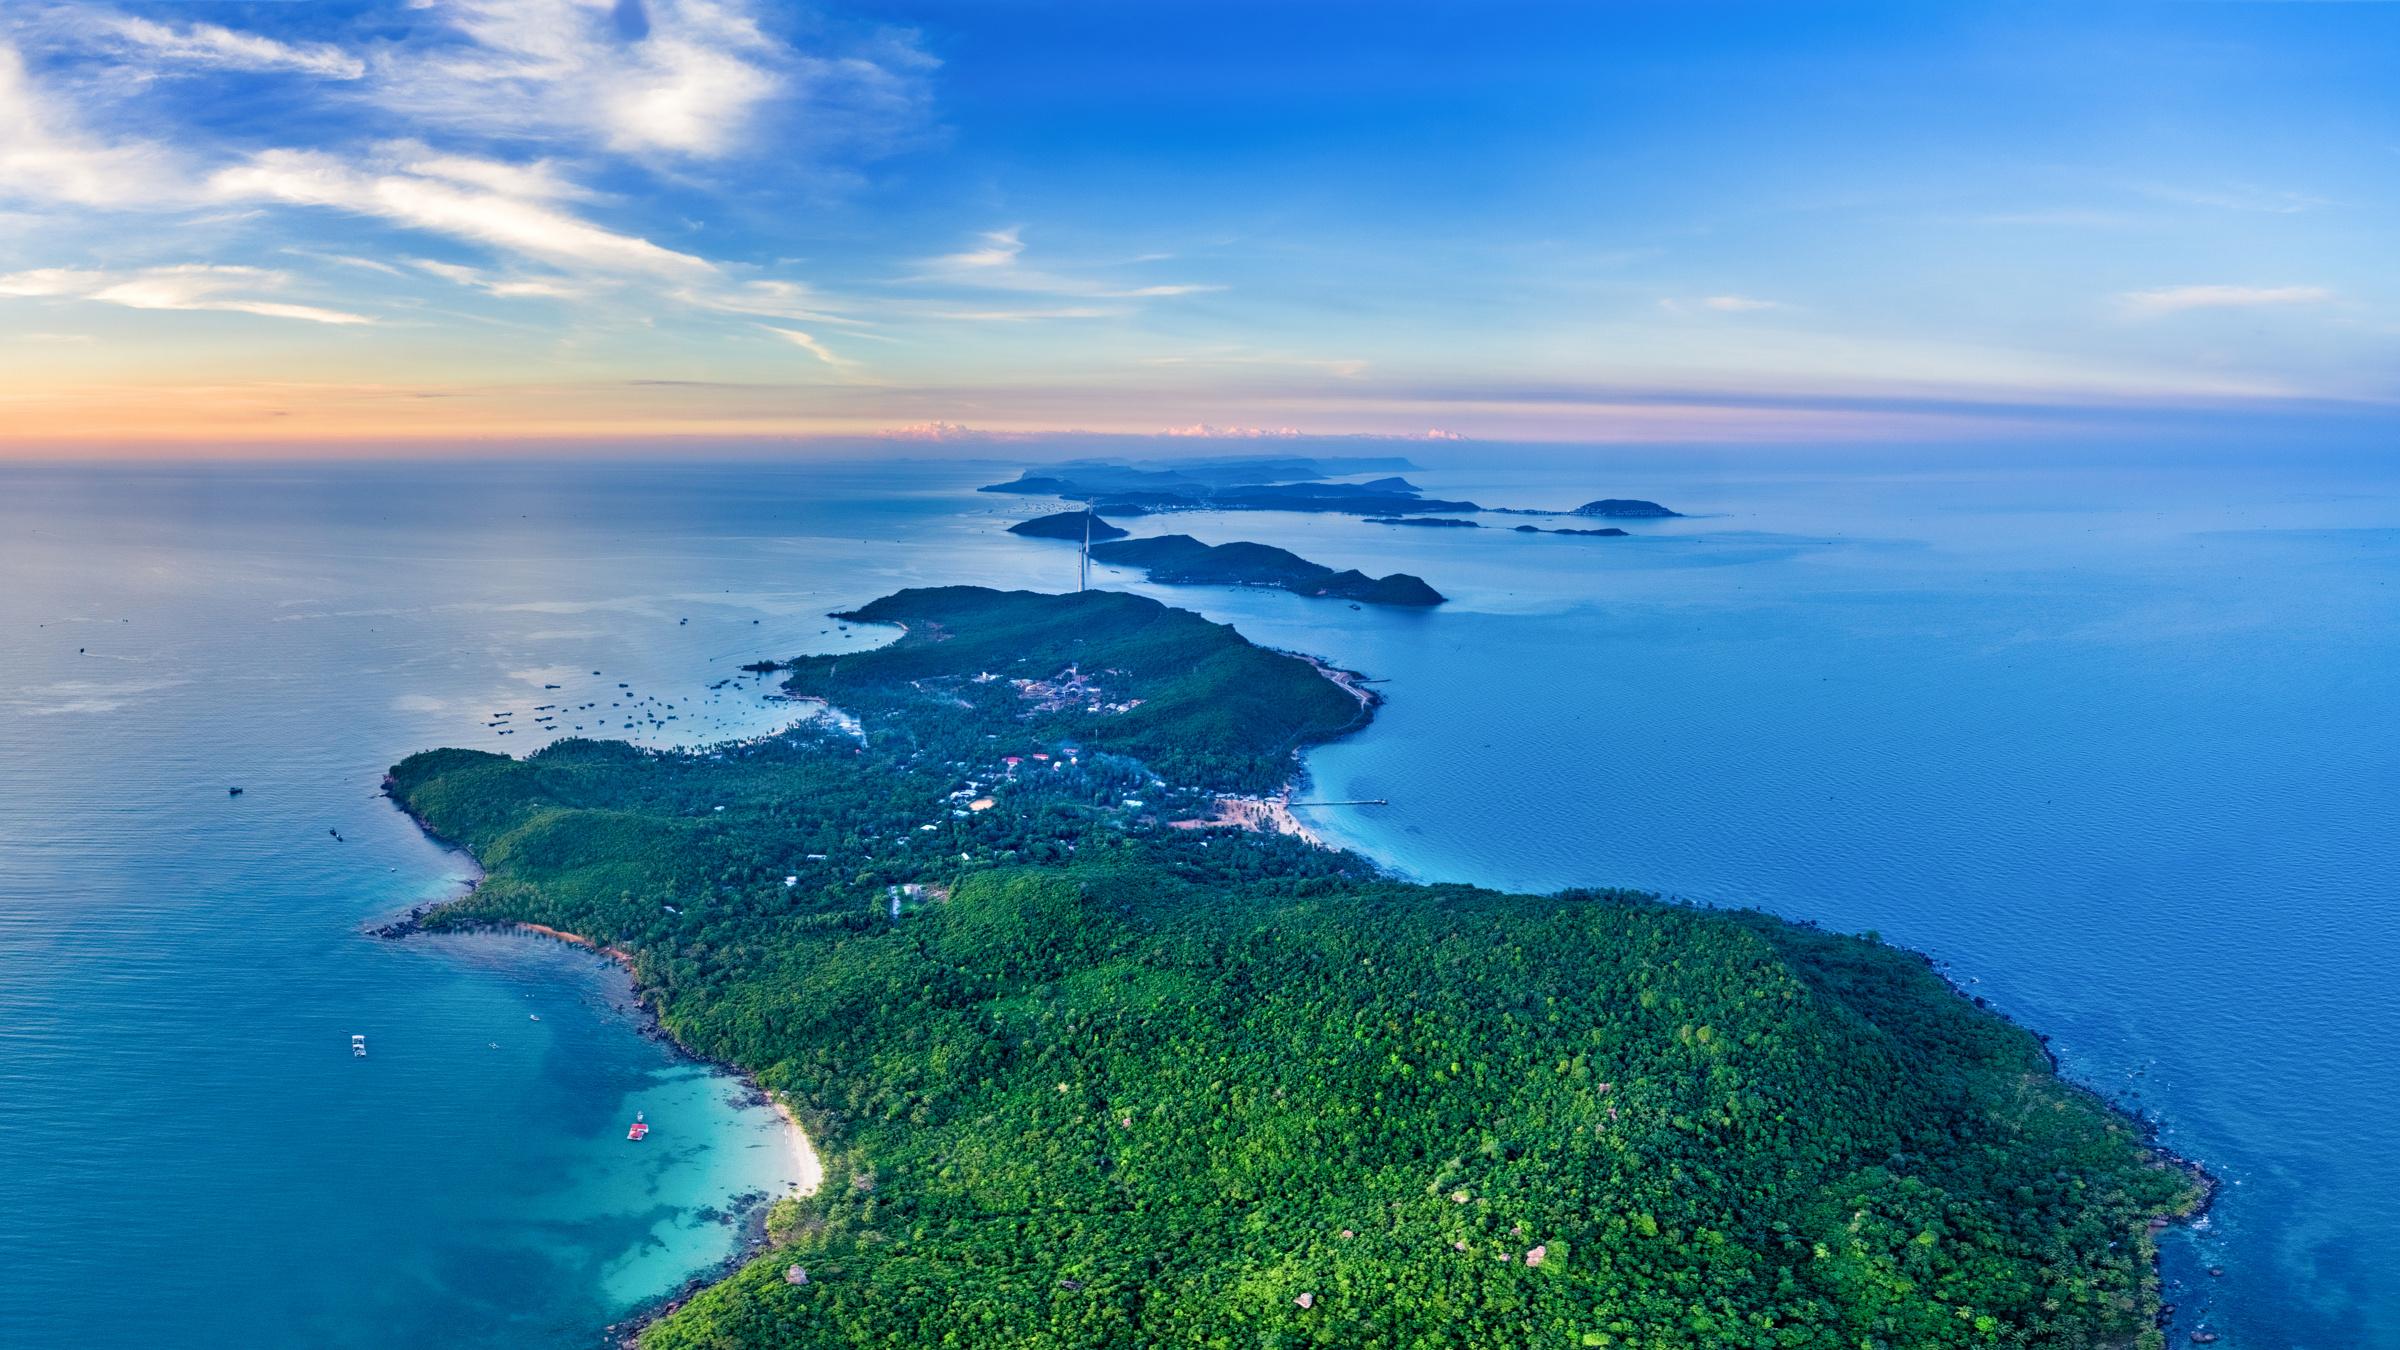 14 Day Vietnam Tour with Phu Quoc Beach Break